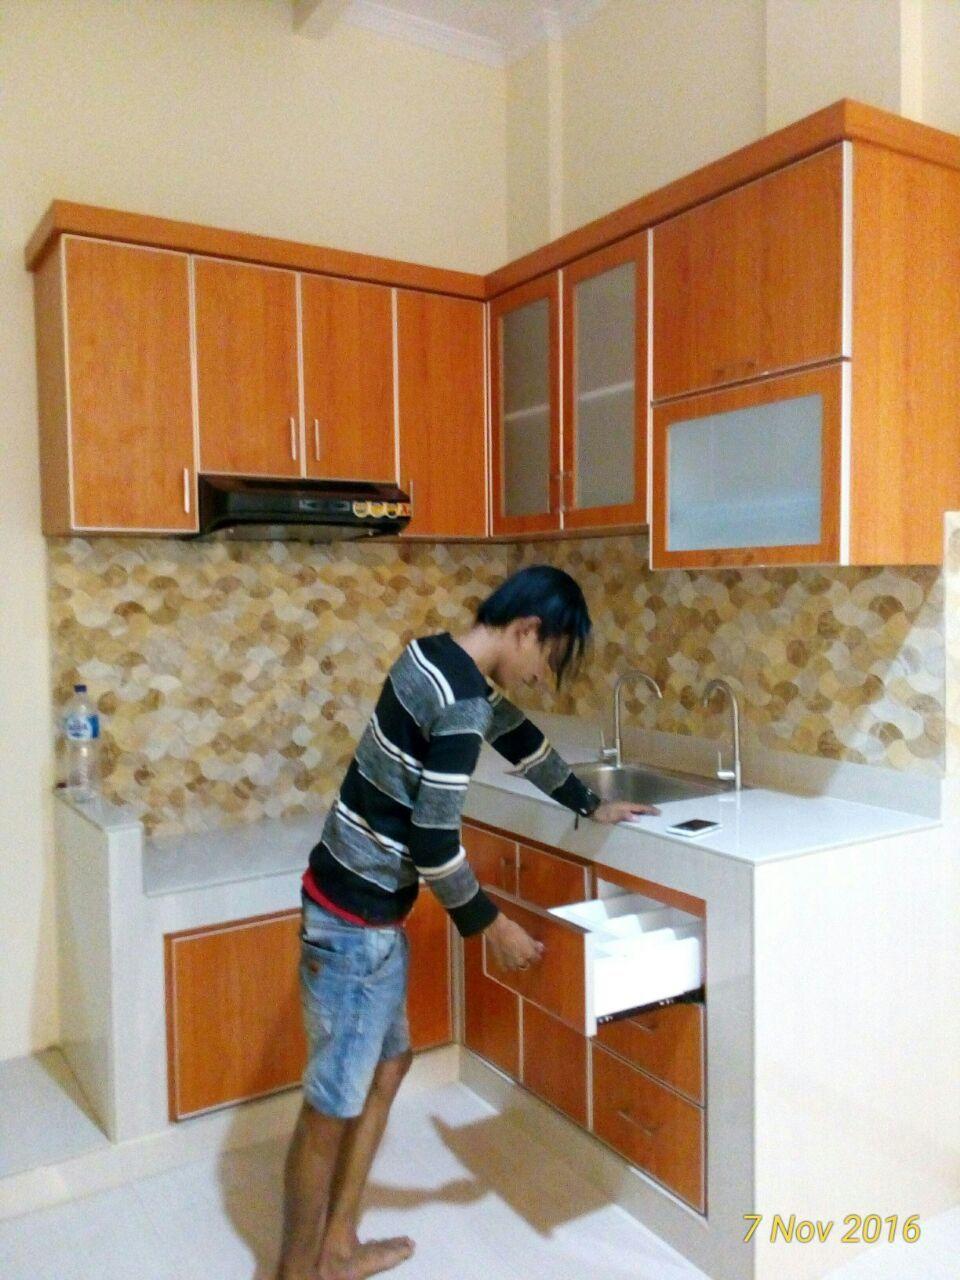 Lemari gantung dapur memang menjadi idaman bagi ibu rumah tangga dengan adanya perabot ini membuat